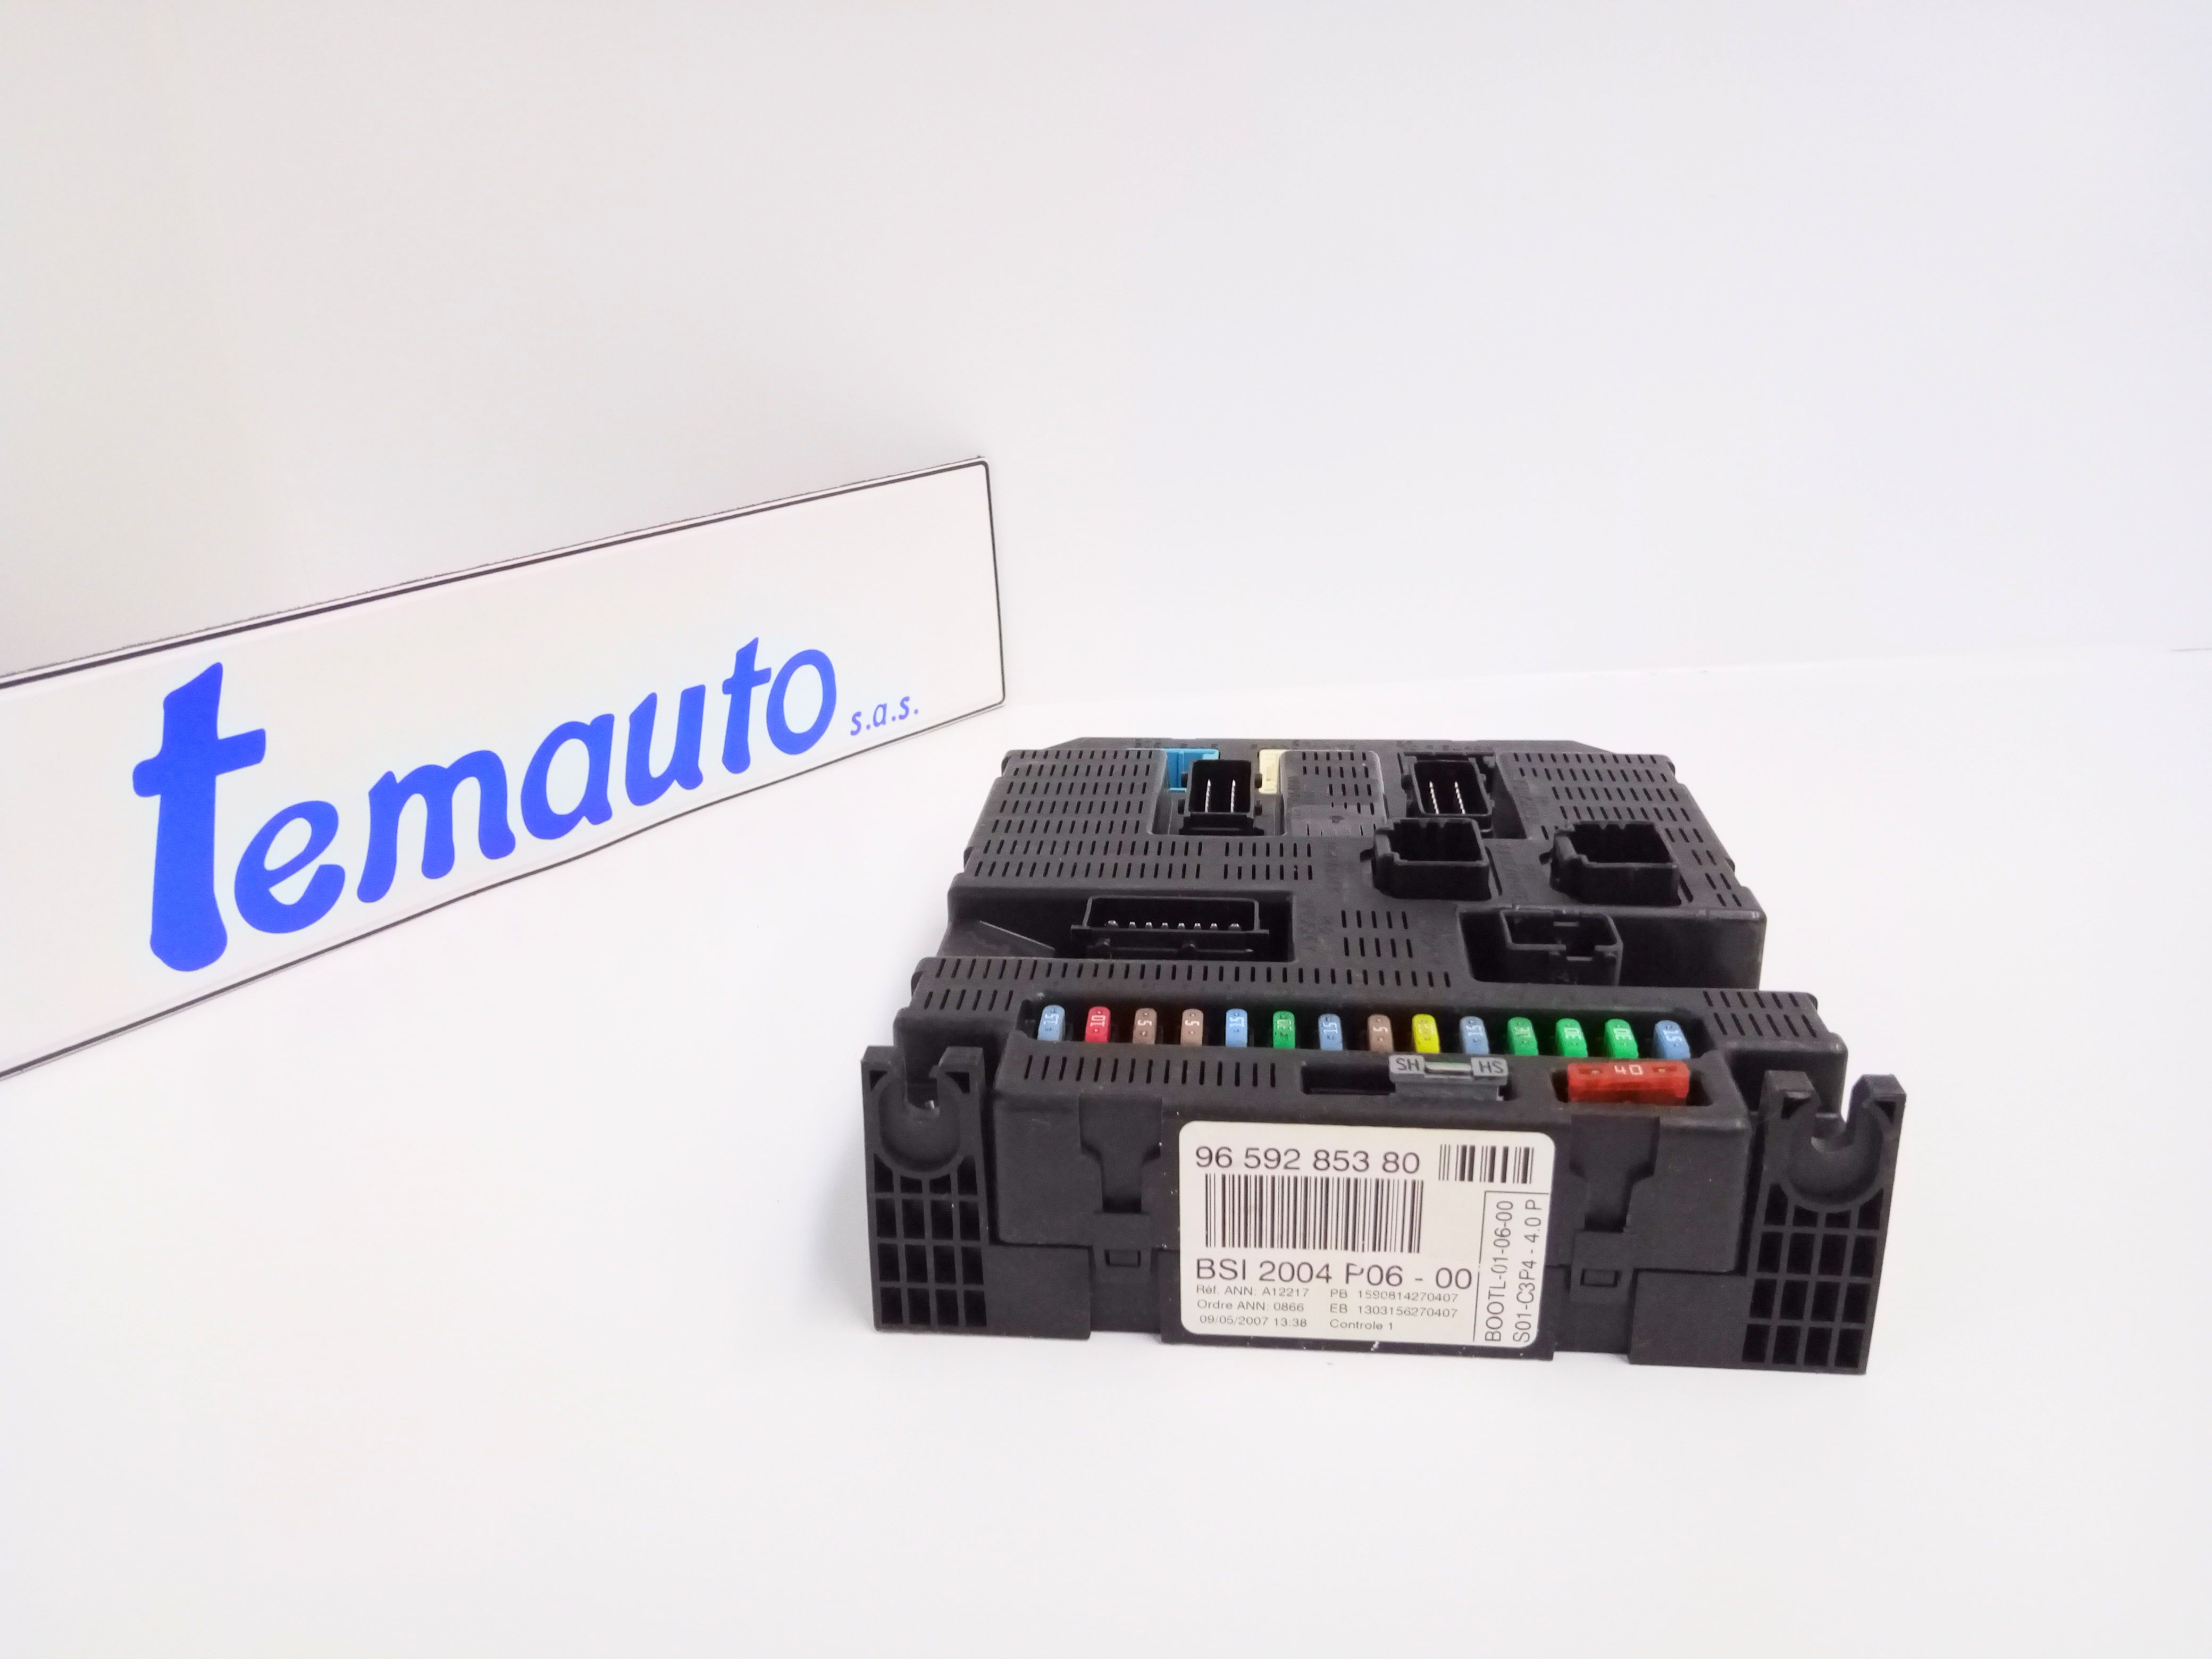 9659285380 BODY COMPUTER PEUGEOT 207 1° Serie 1400 Diesel  (2007) RICAMBI USATI